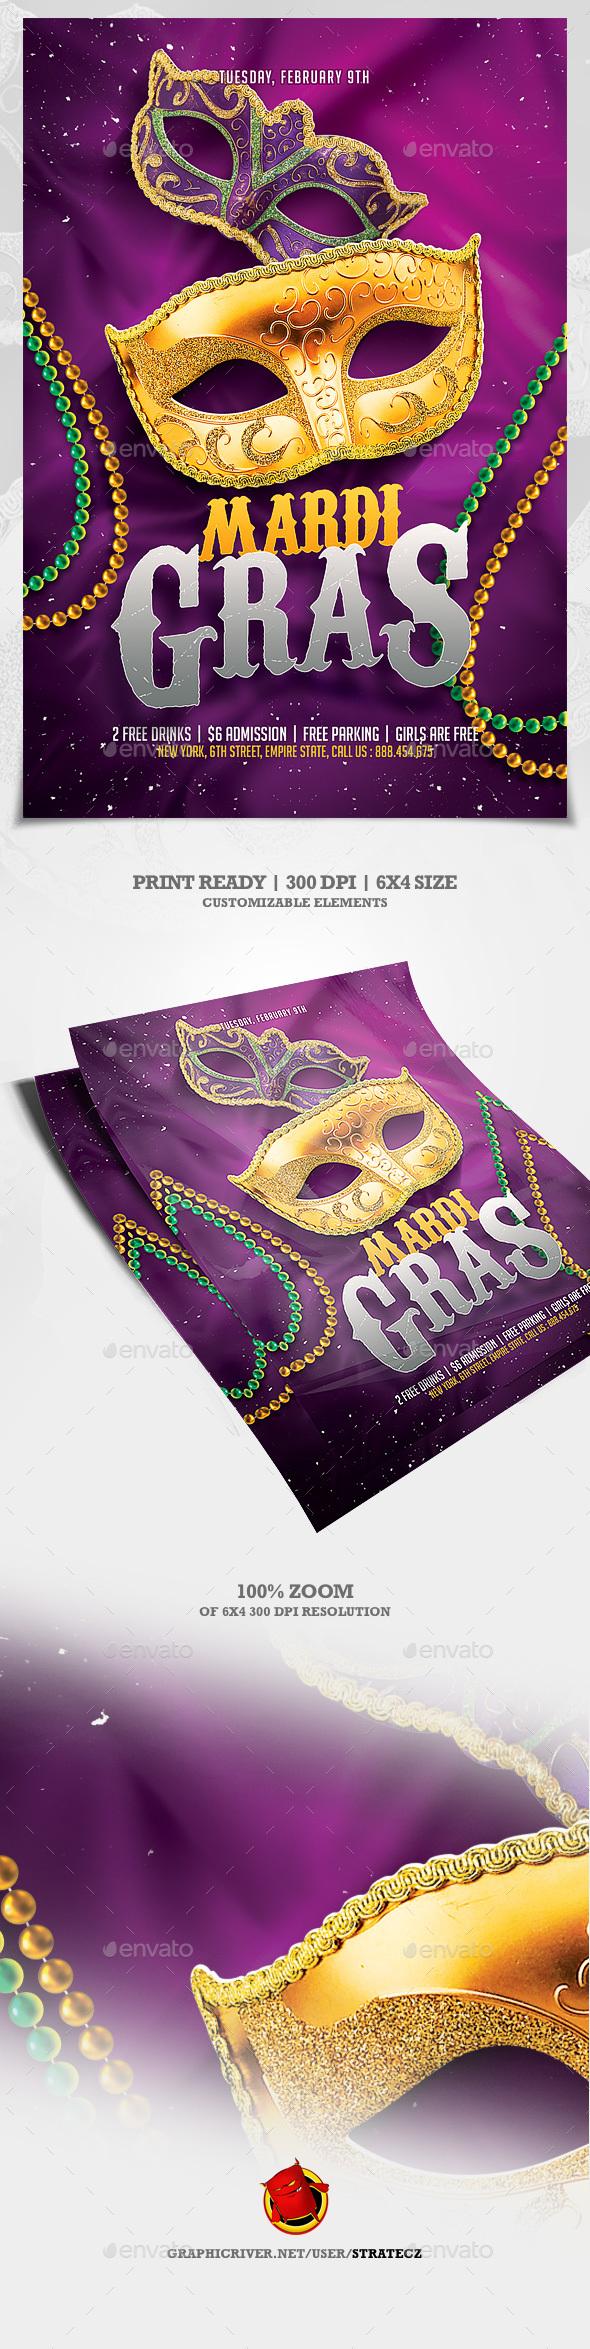 Mardi Gras Flyer - Print Templates